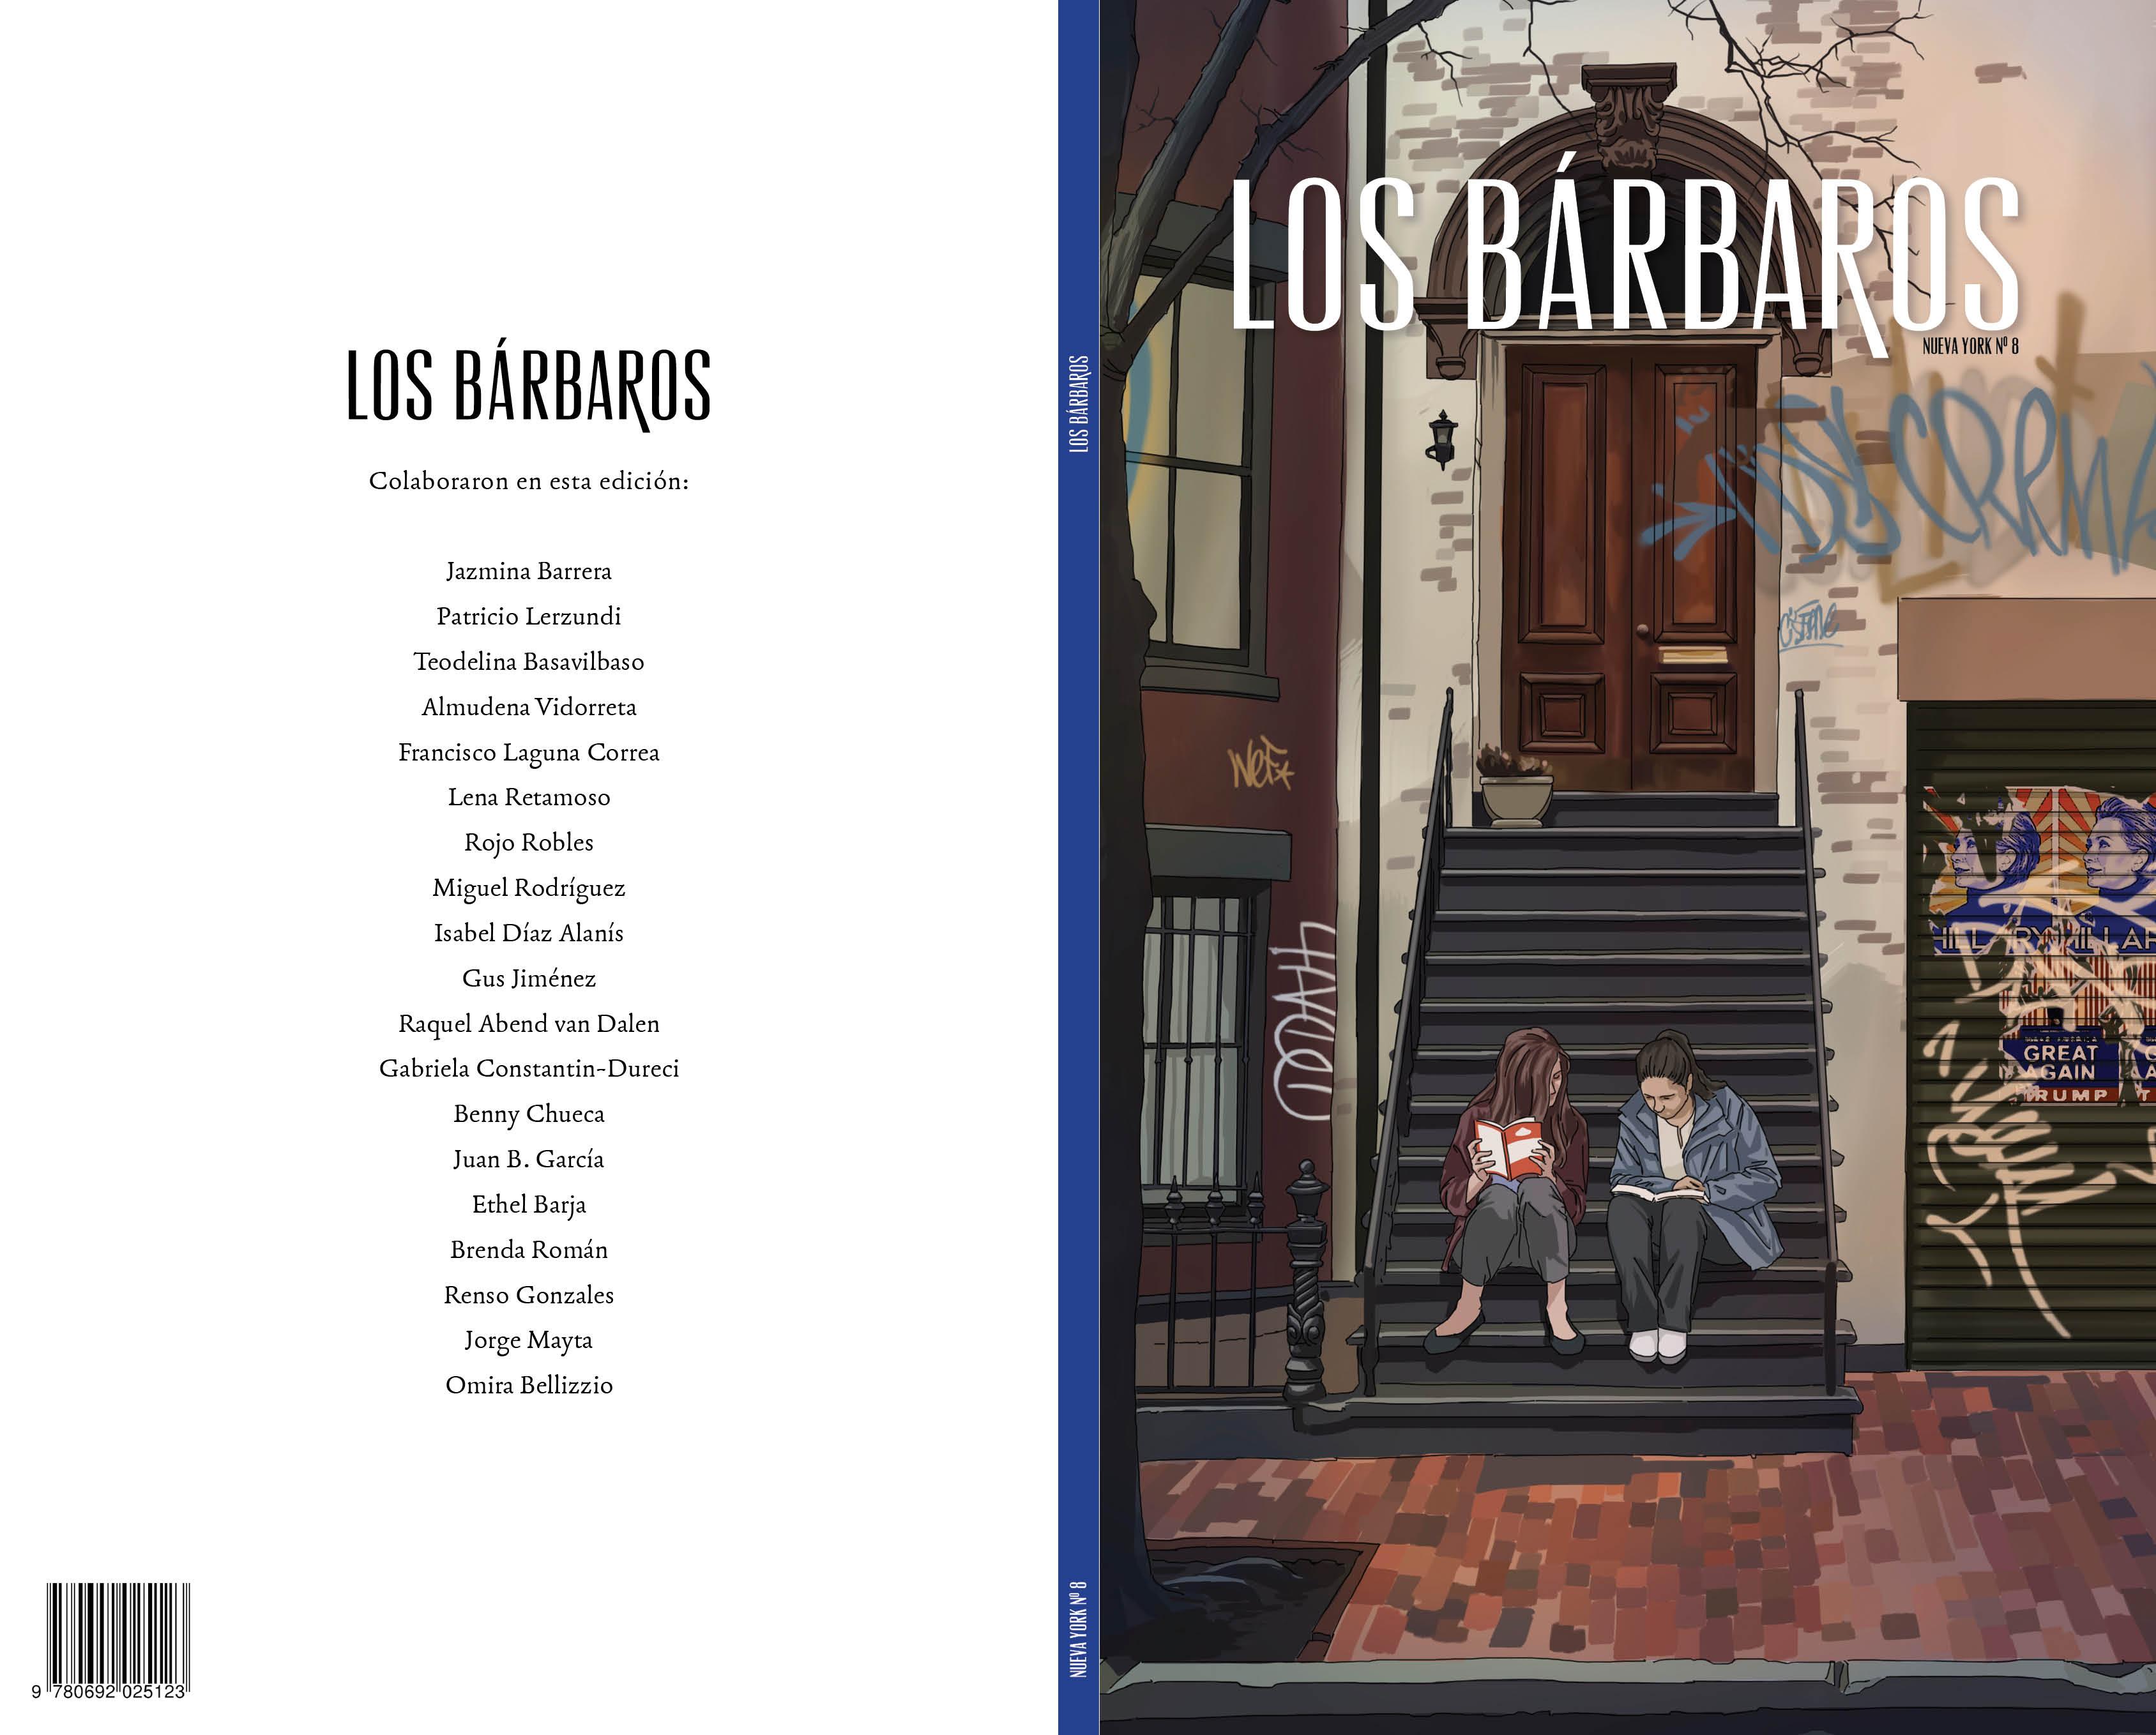 CARATULA 8 BARBAROS.jpg